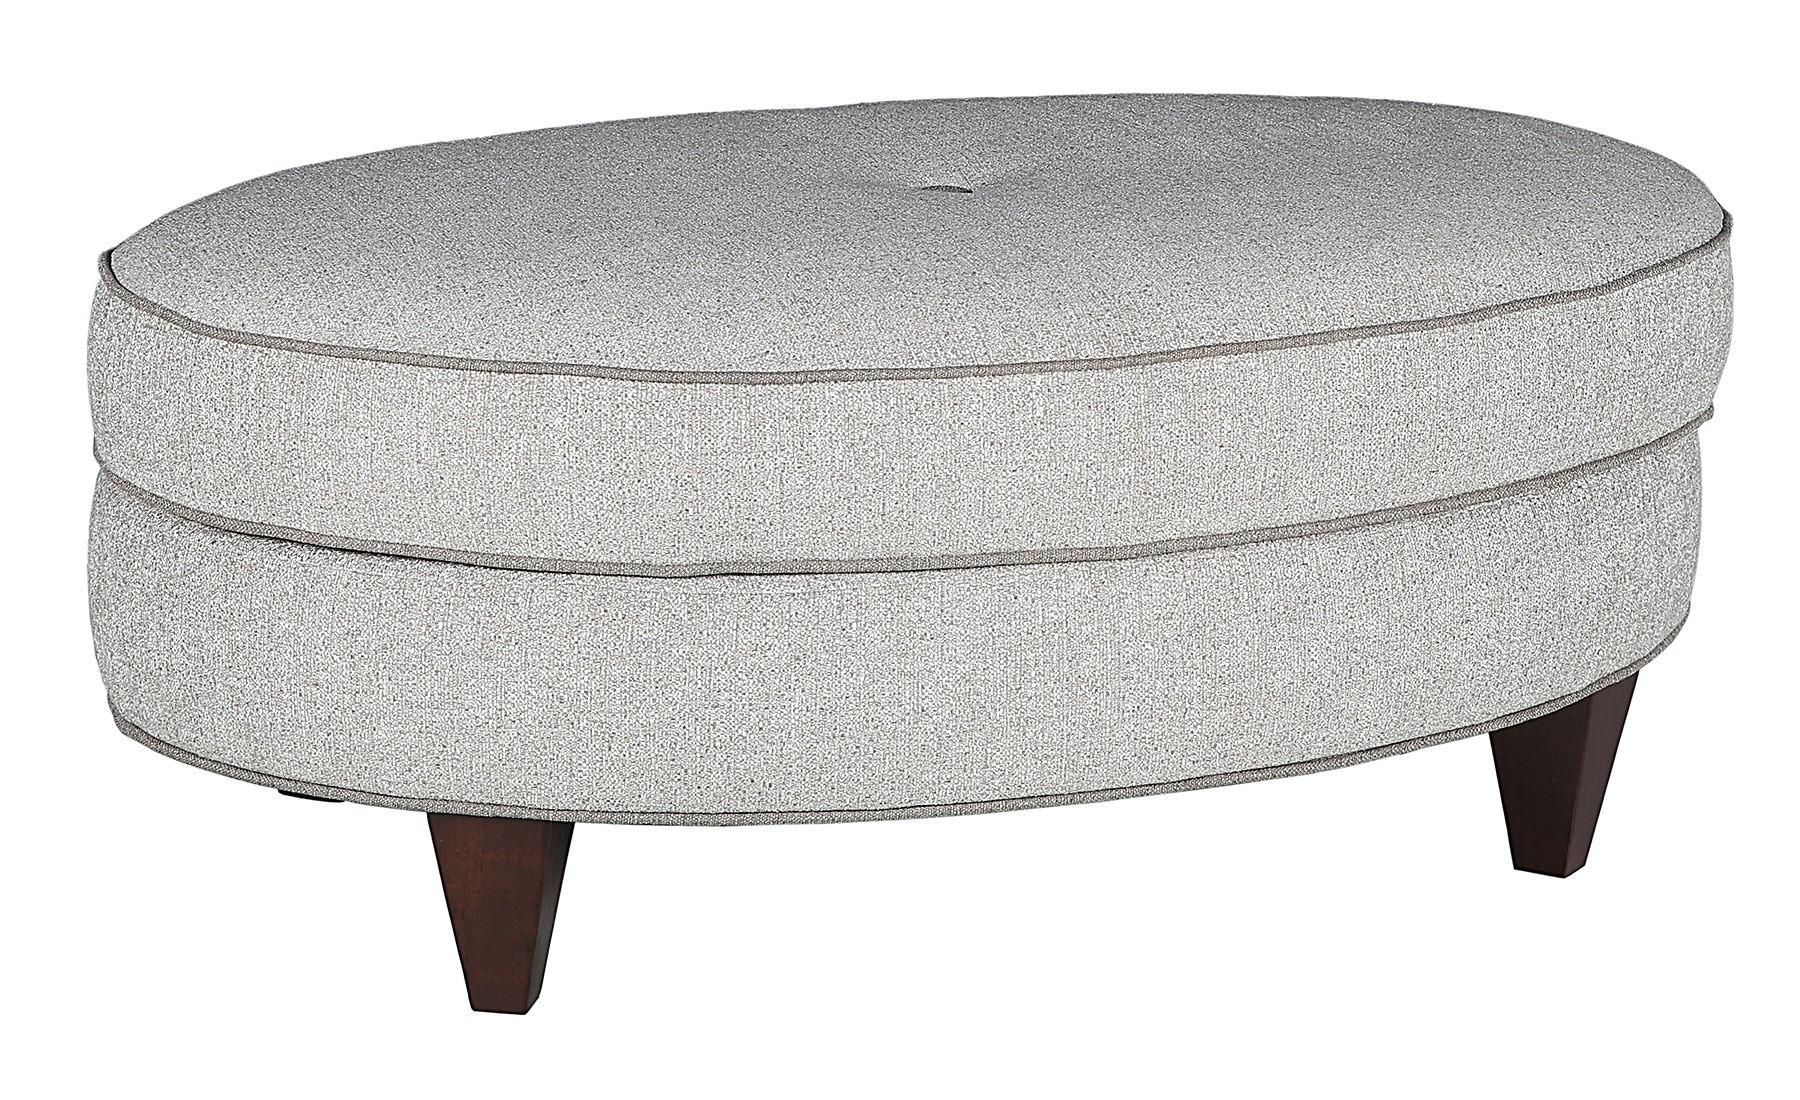 Merveilleux Marshfield Furniture Erin Oval Storage Ottoman MF1965 29